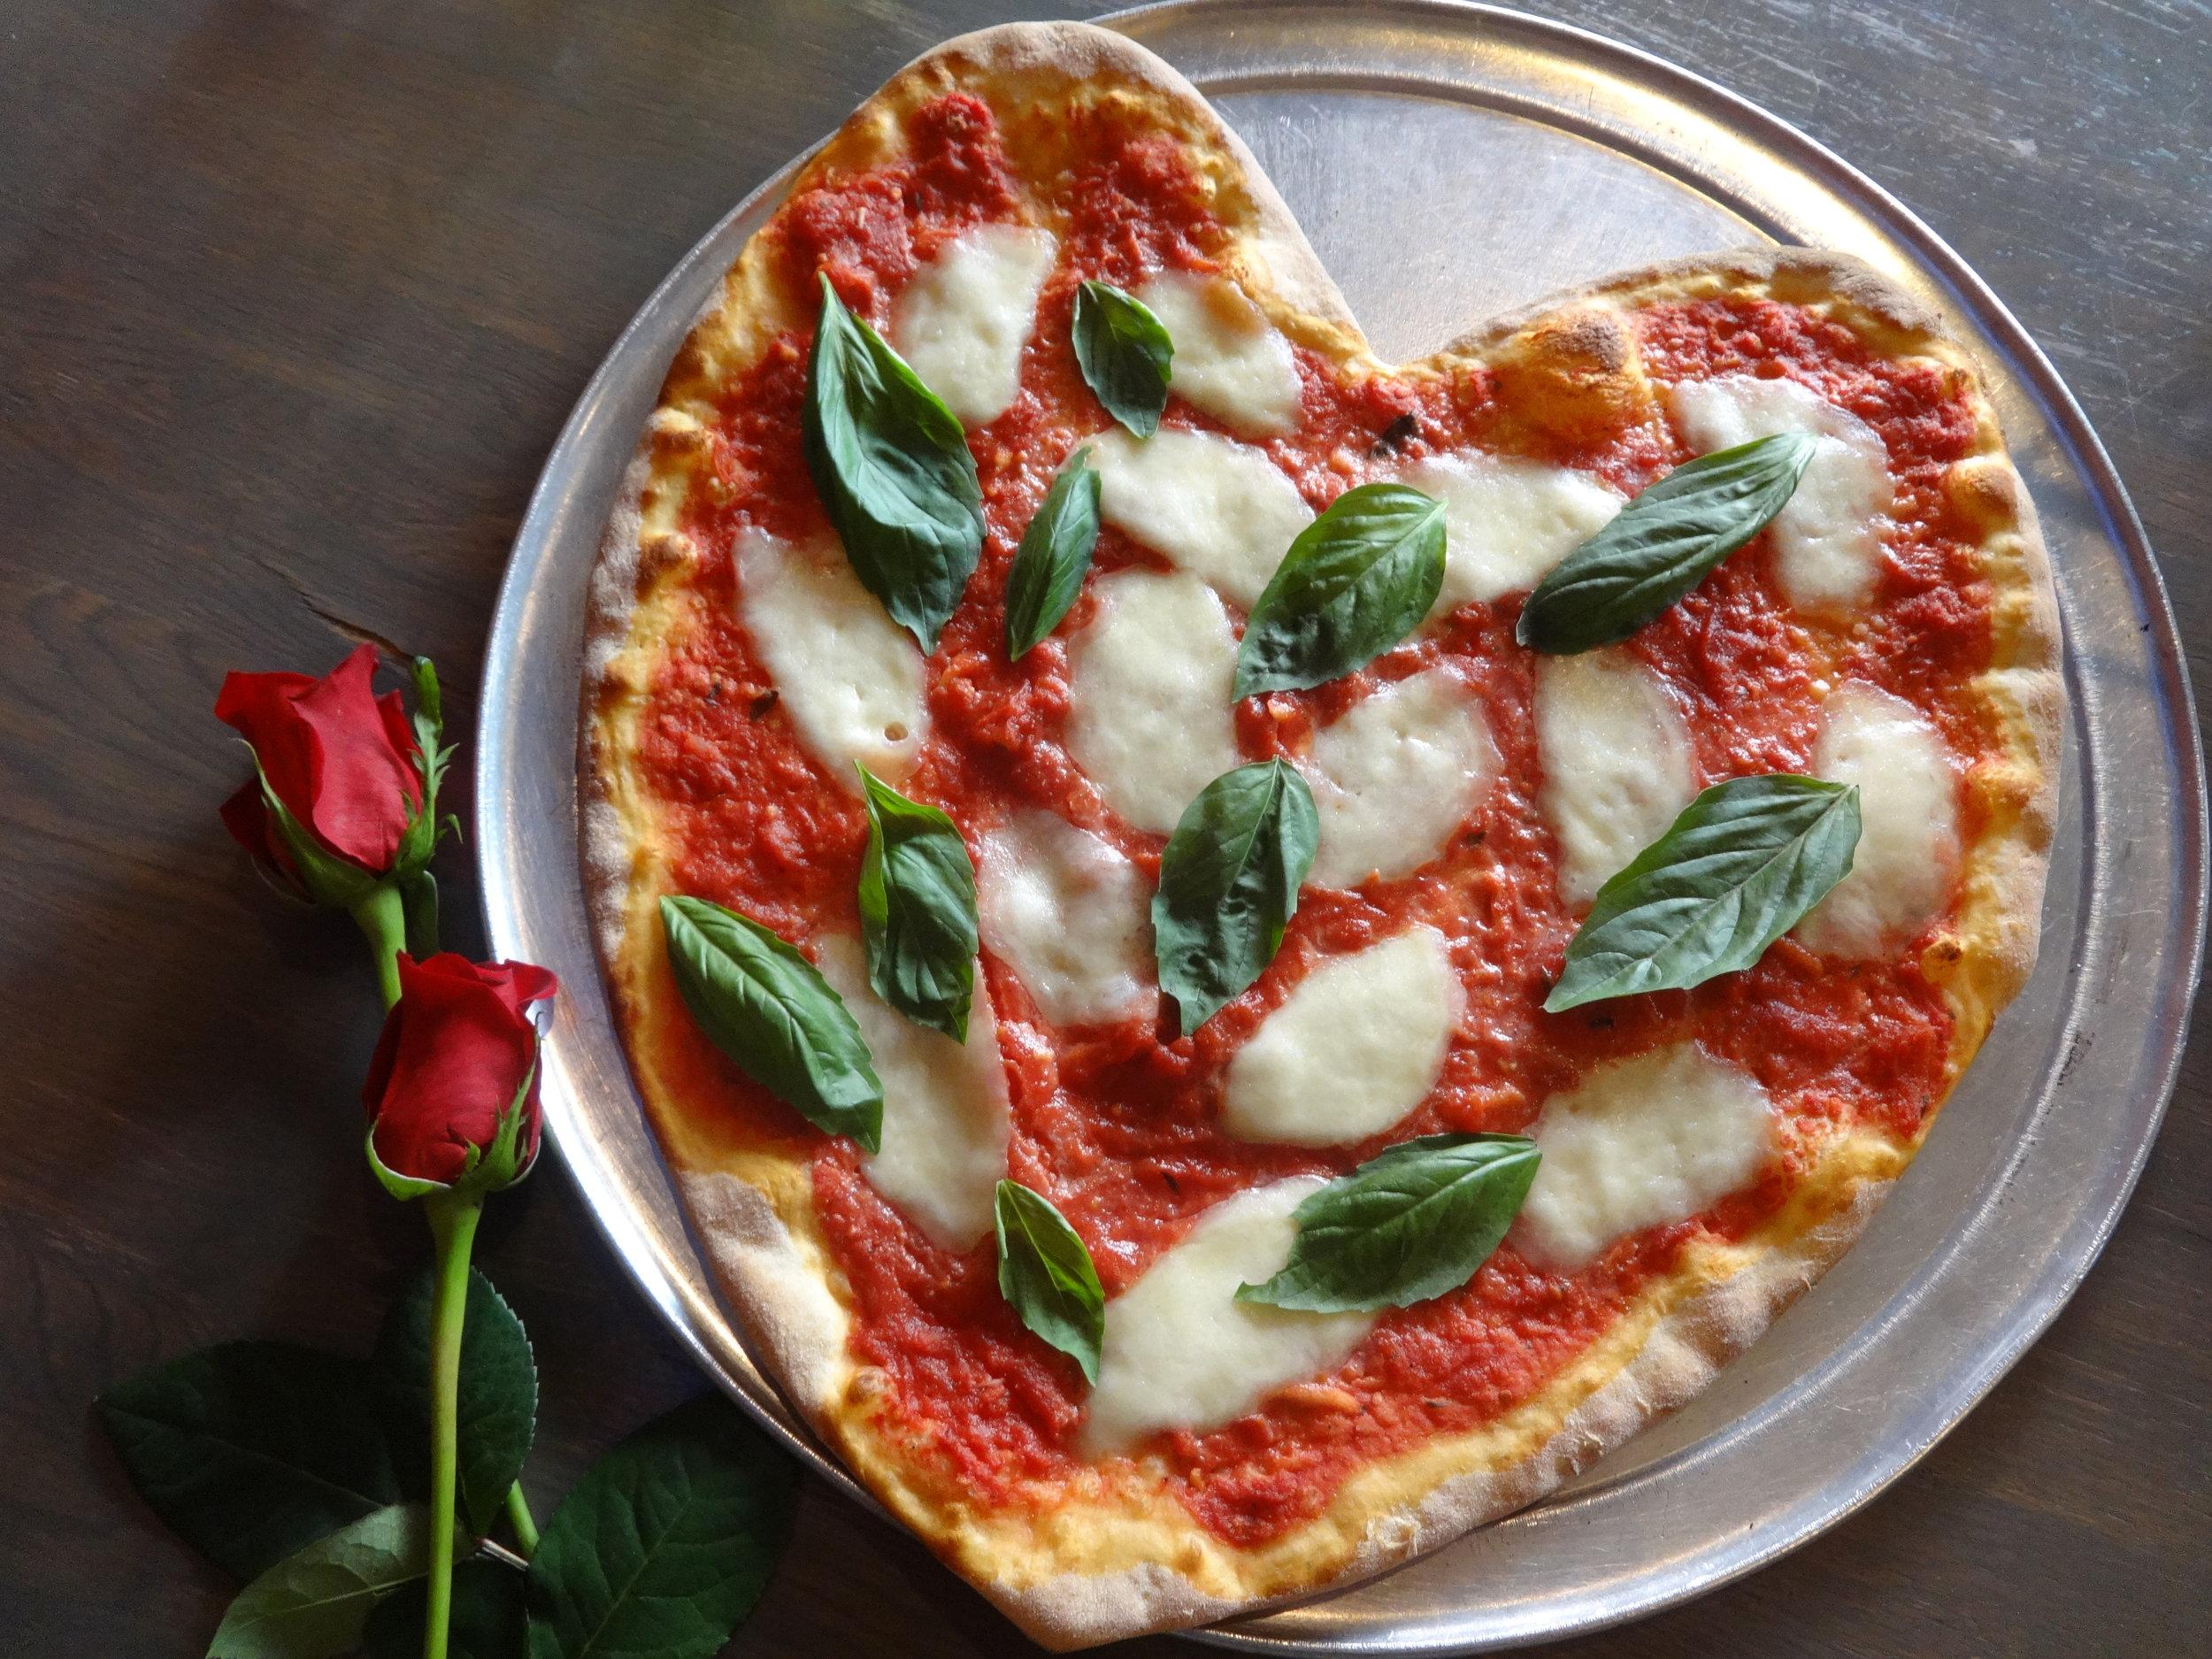 slice, sermania, romantic, heart shaped pizza, heart pizza, rittenhouse, philadelphia, valentine's day